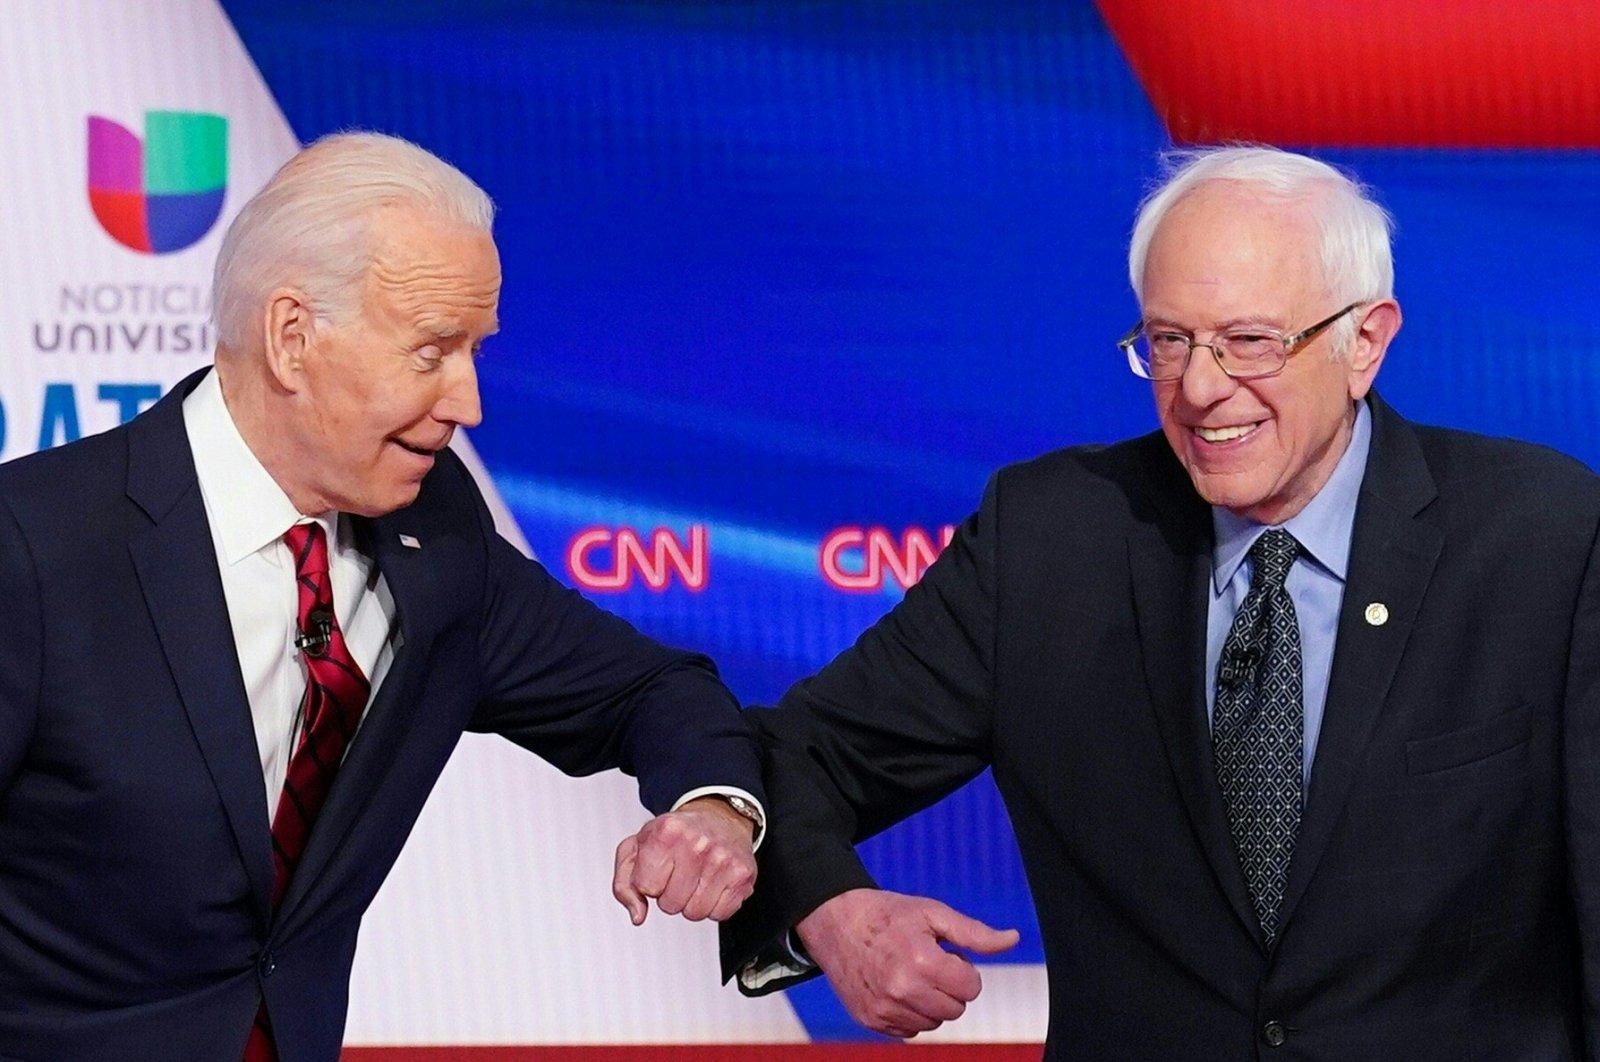 Democratic presidential hopefuls former U.S. Vice President Joe Biden (L) and Sen. Bernie Sanders (R) greet each other with an elbow bump, Washington, D.C., March 15, 2020. (AFP Photo)